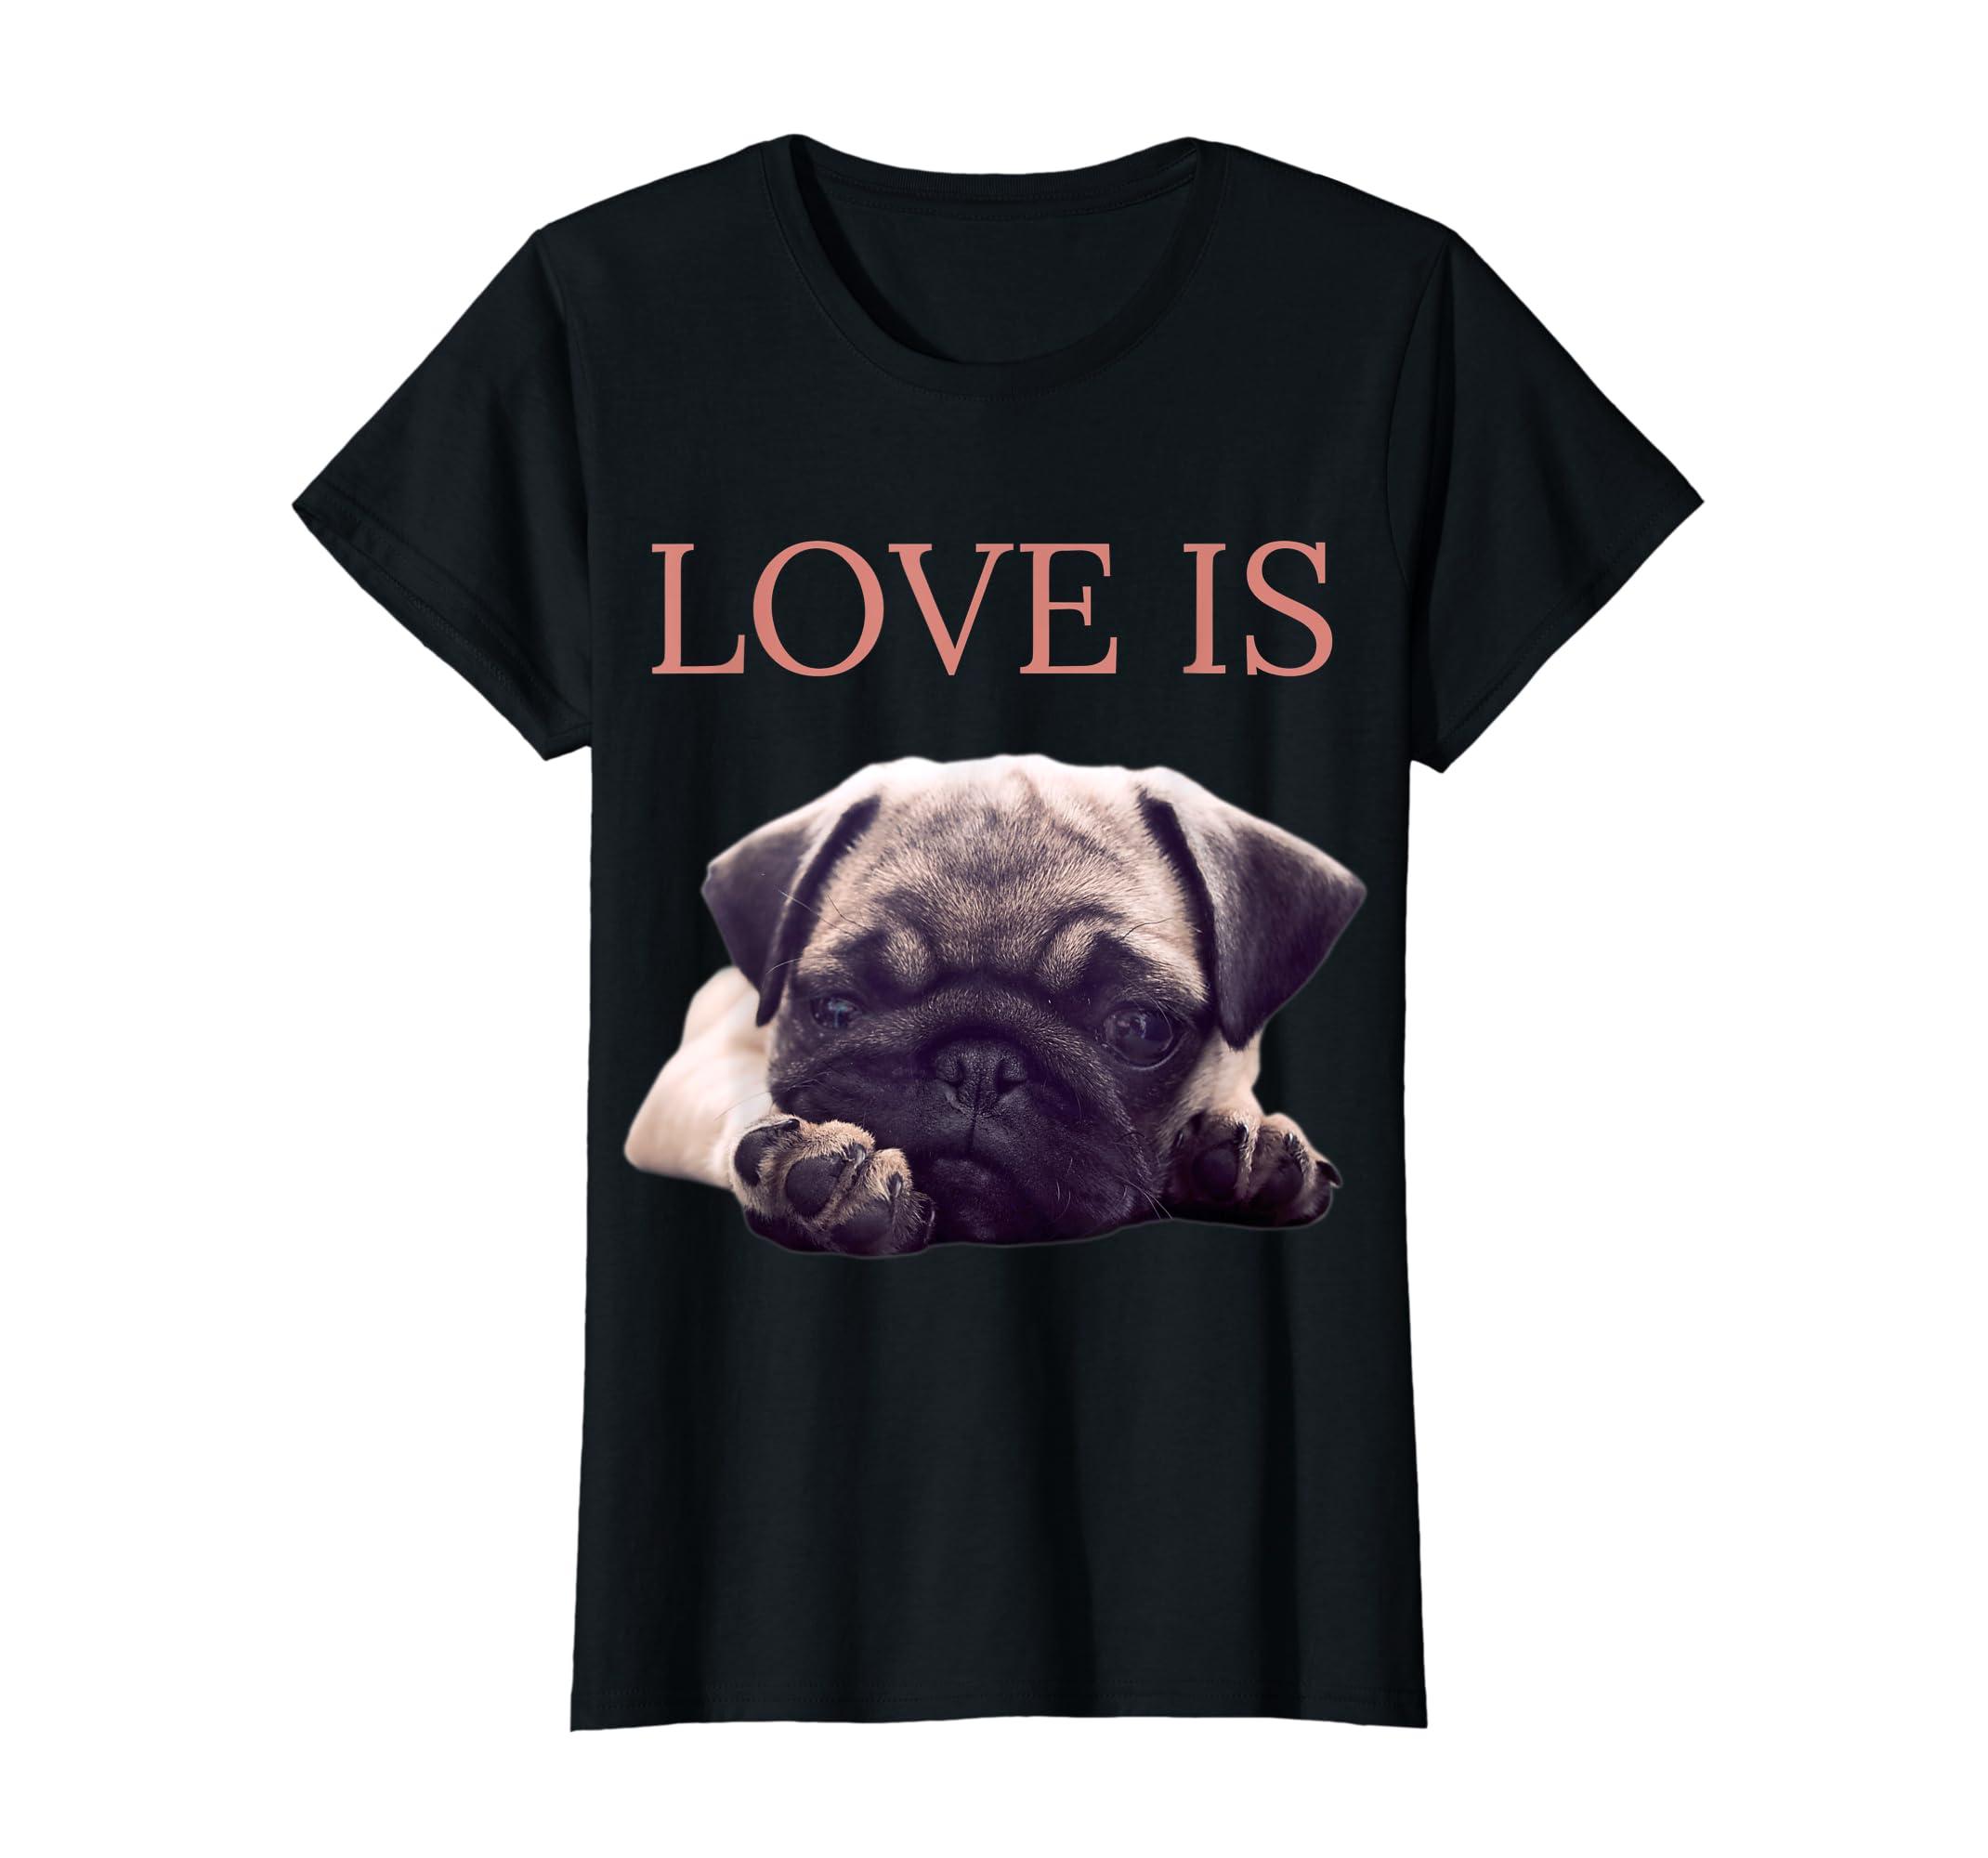 Mothers Day Pug Shirt Women Men Pug Mom Life Tee Love Is Dog-Women's T-Shirt-Black